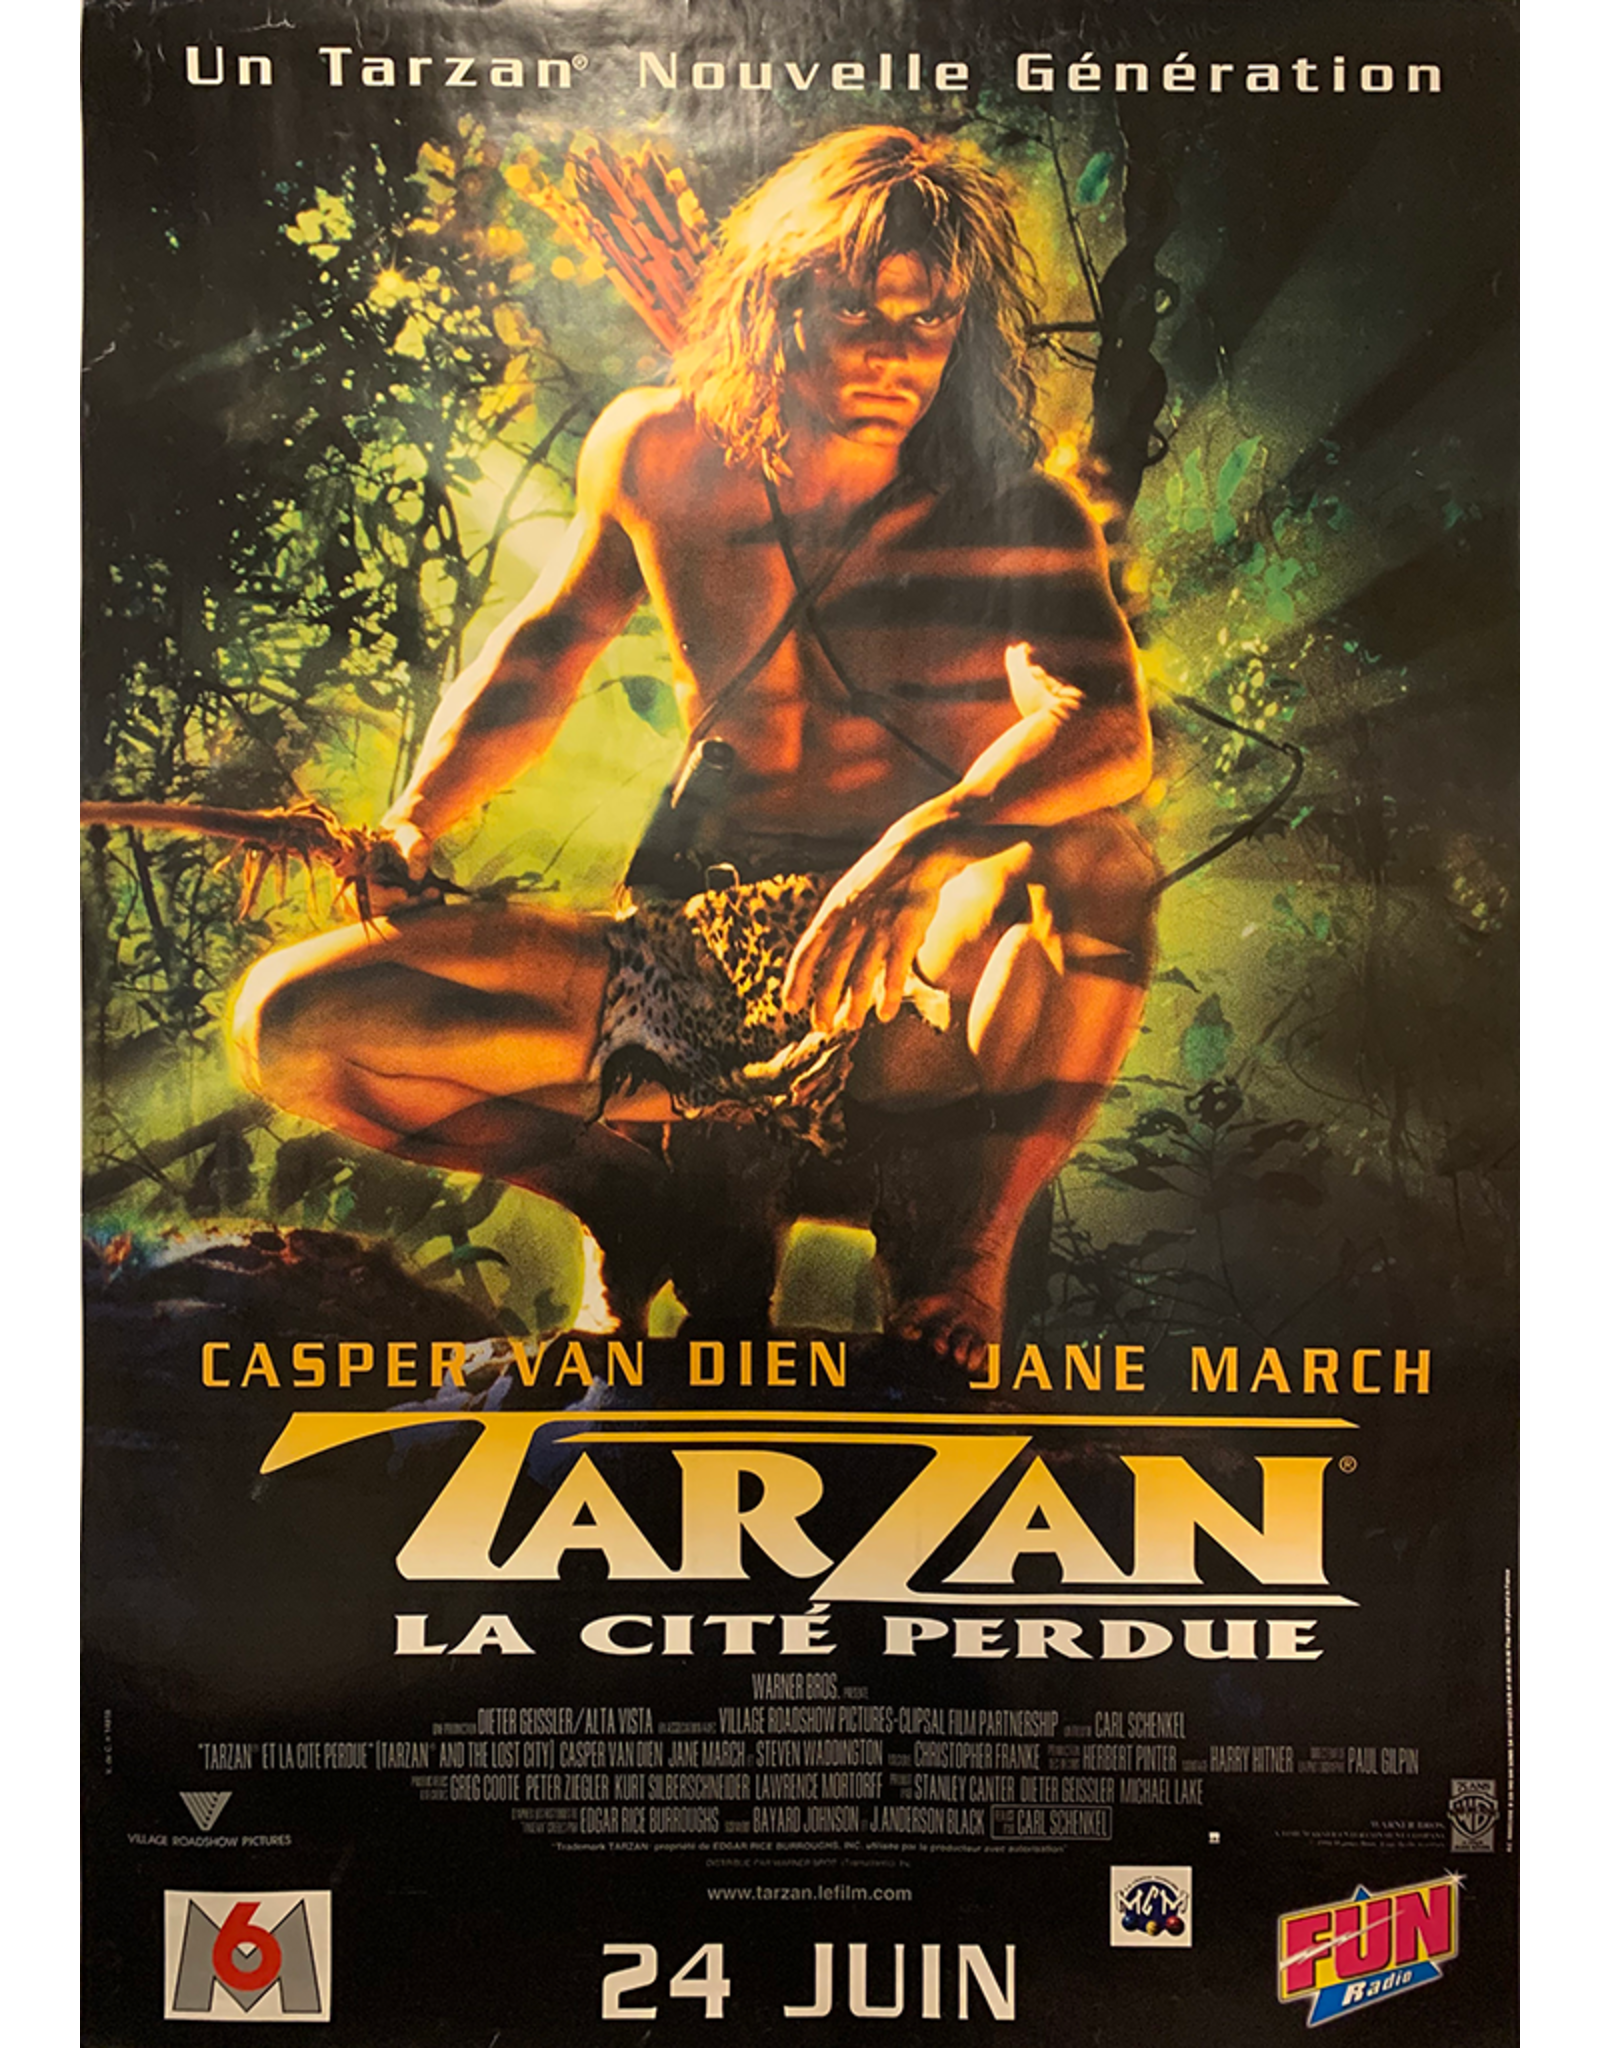 SPV Tarzan La Cite Perdue, 1998, French